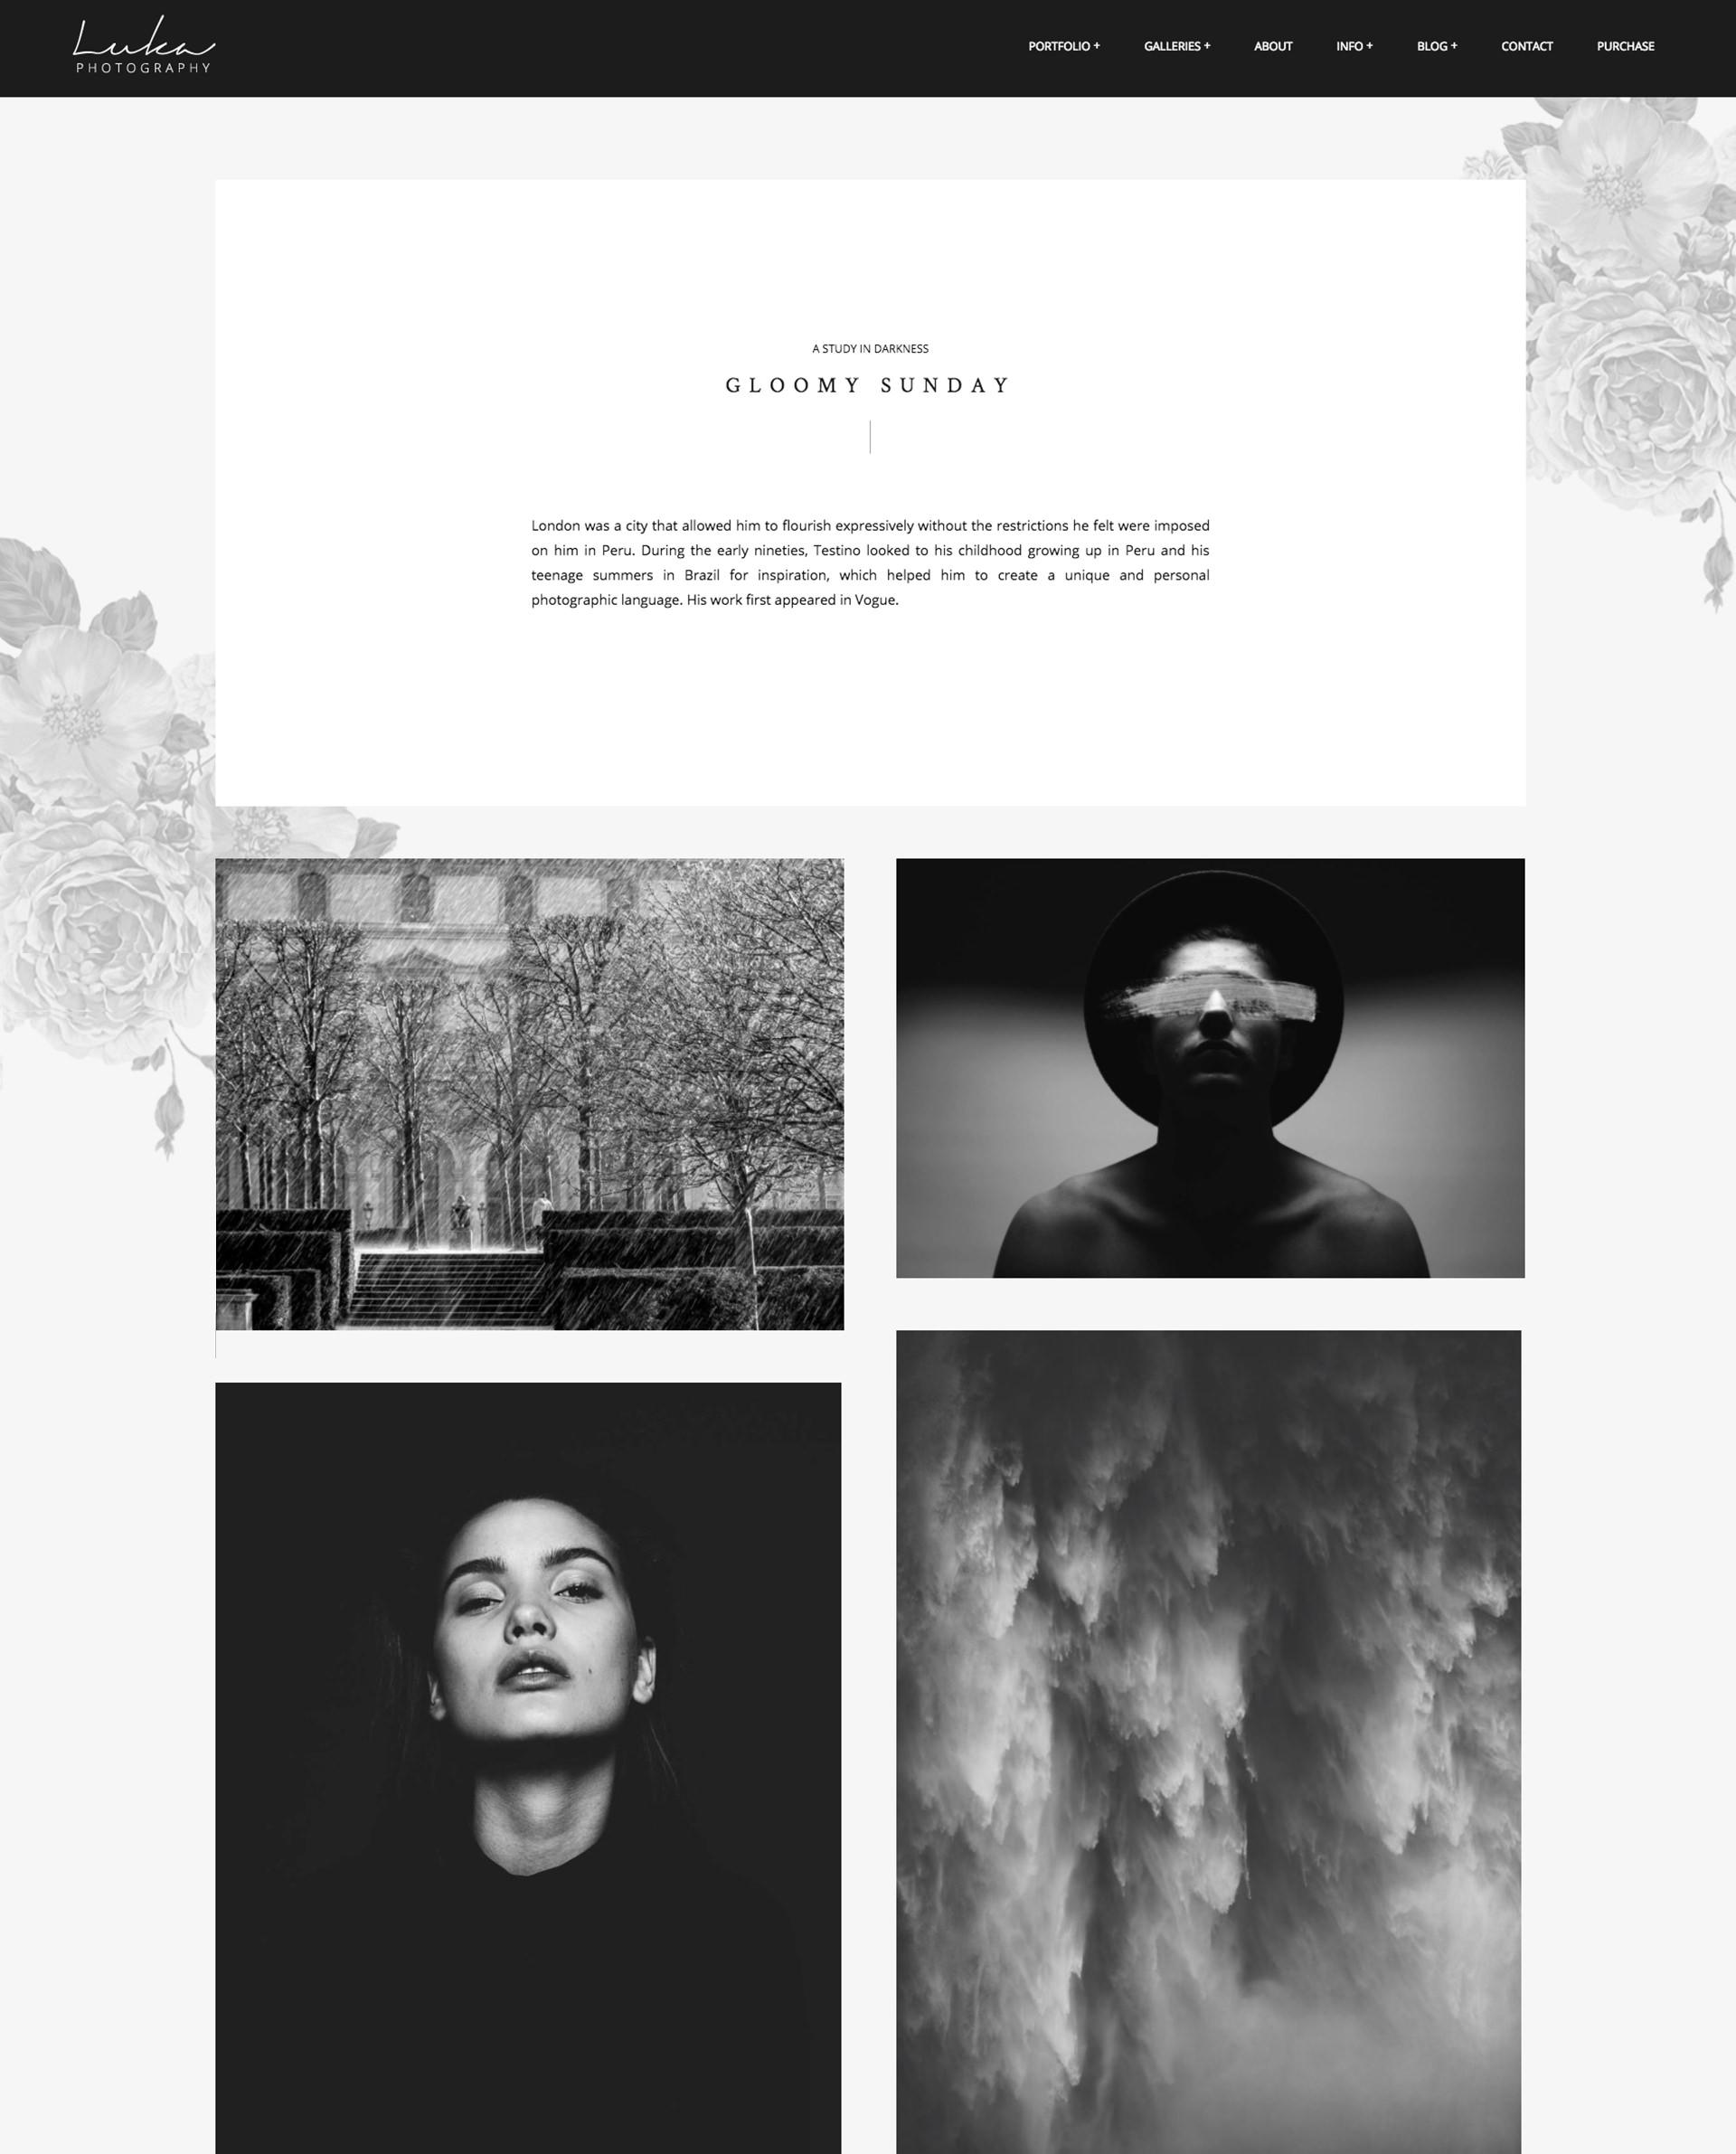 Luka Portfolio Theme for Photographers - masonry gallery layout with text